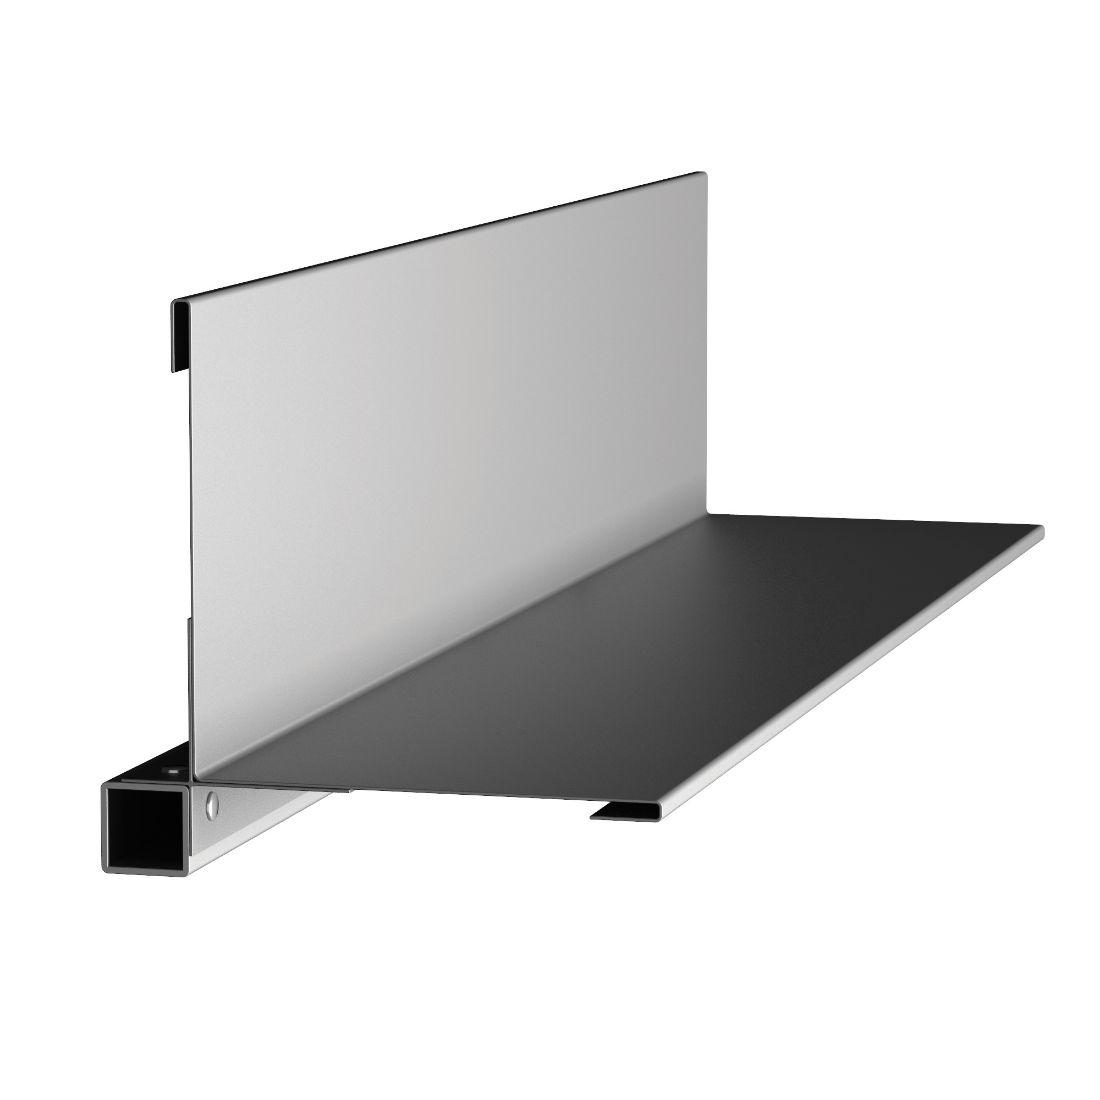 Shadowclad External Box Angle Stainless Steel Flashing 3.0m